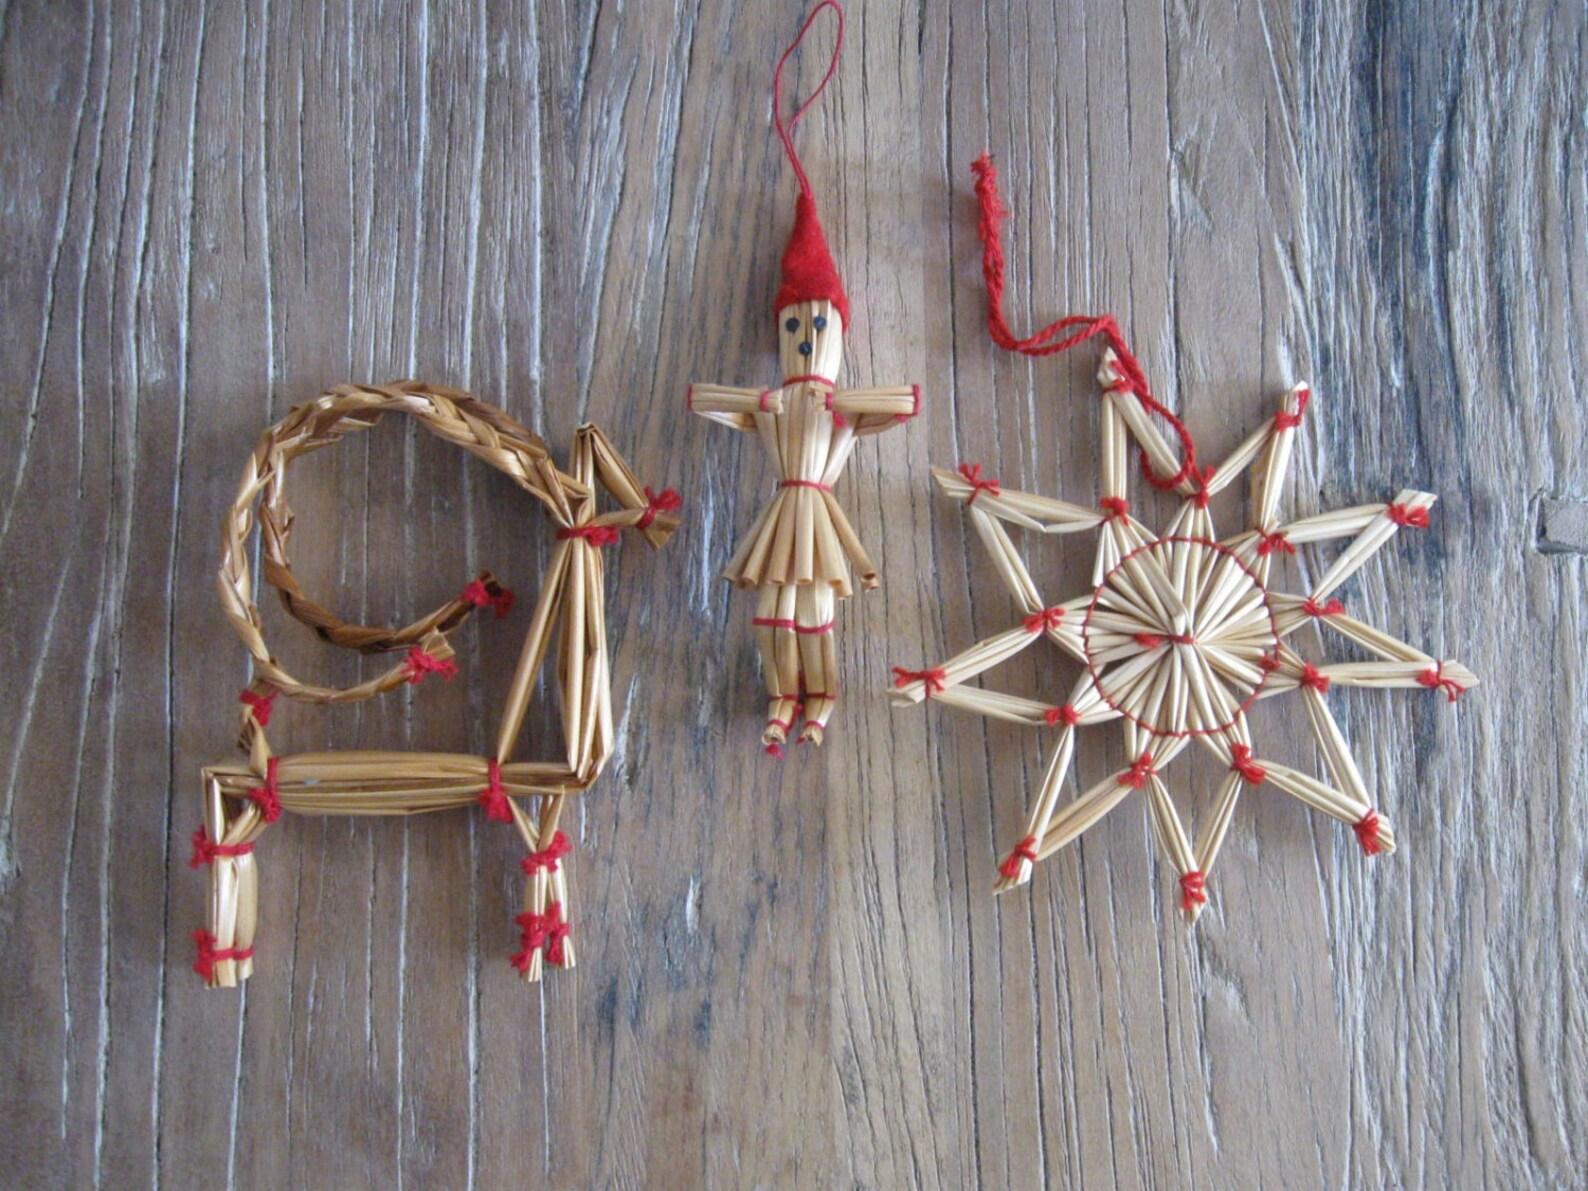 3 German Straw Christmas Ornaments